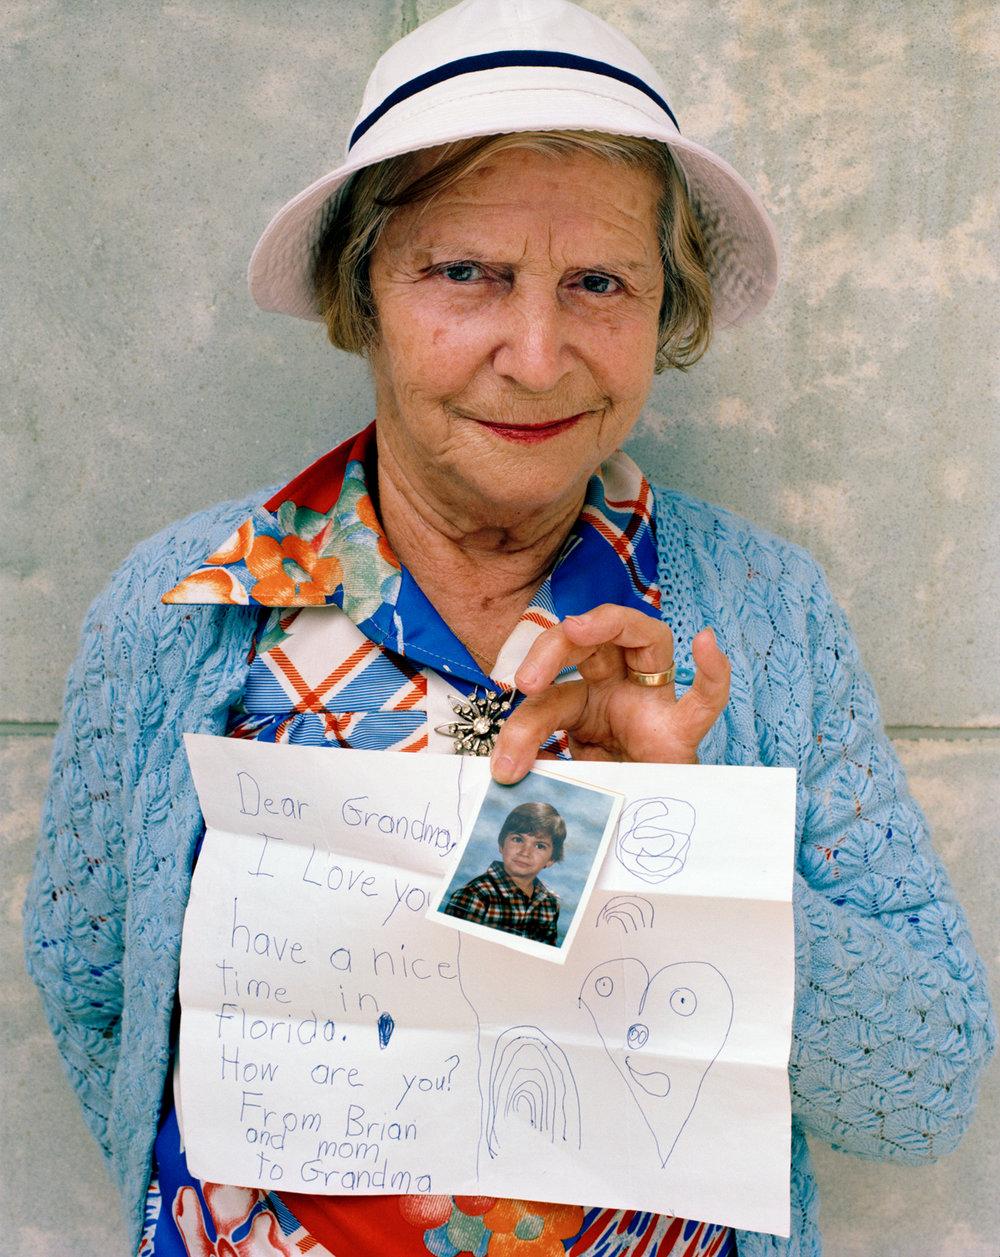 Untitled (Grandma) Miami - South Beach 1982-85